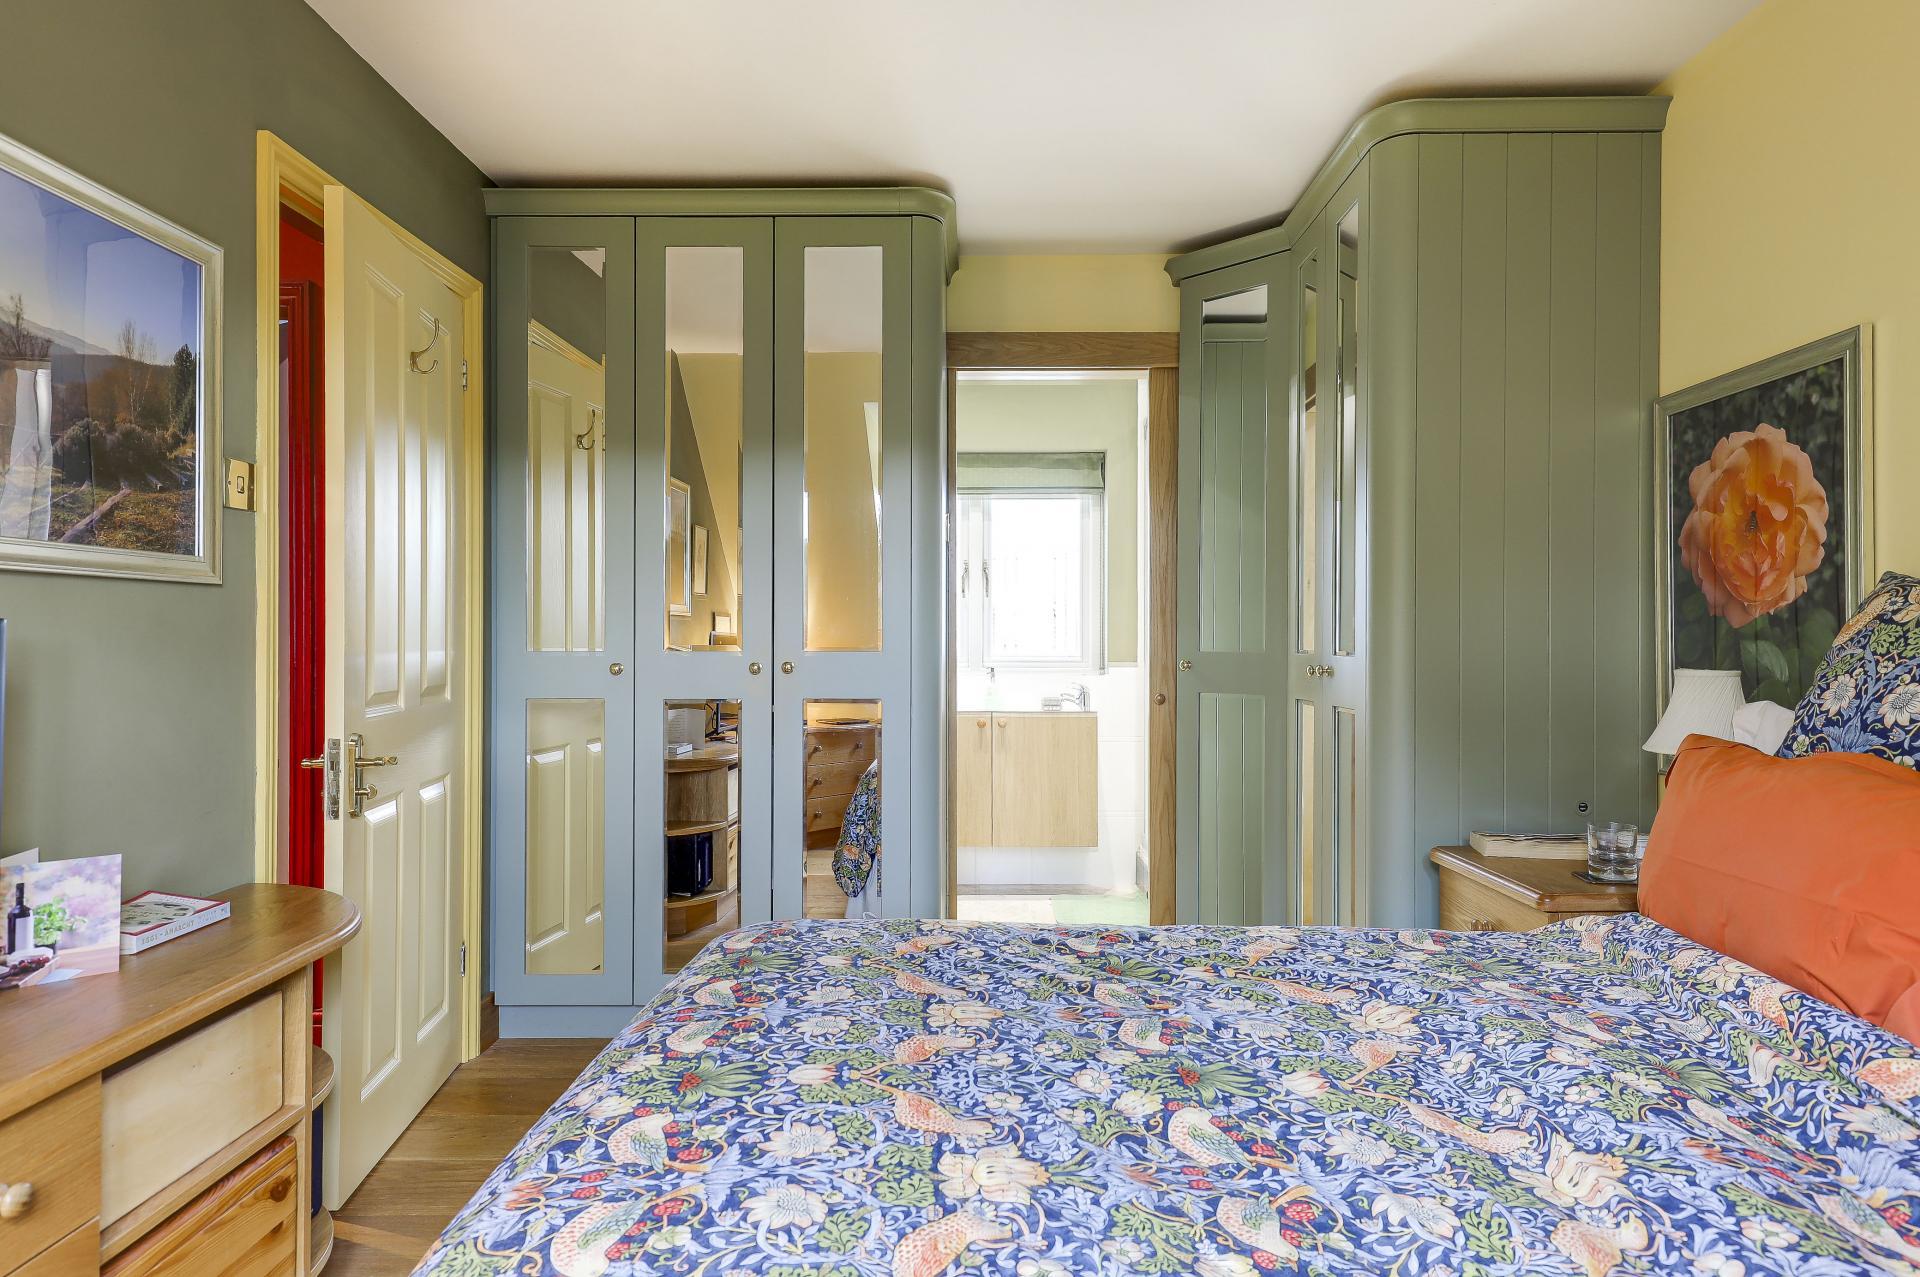 4 bedroom detached house for sale in royston. Black Bedroom Furniture Sets. Home Design Ideas